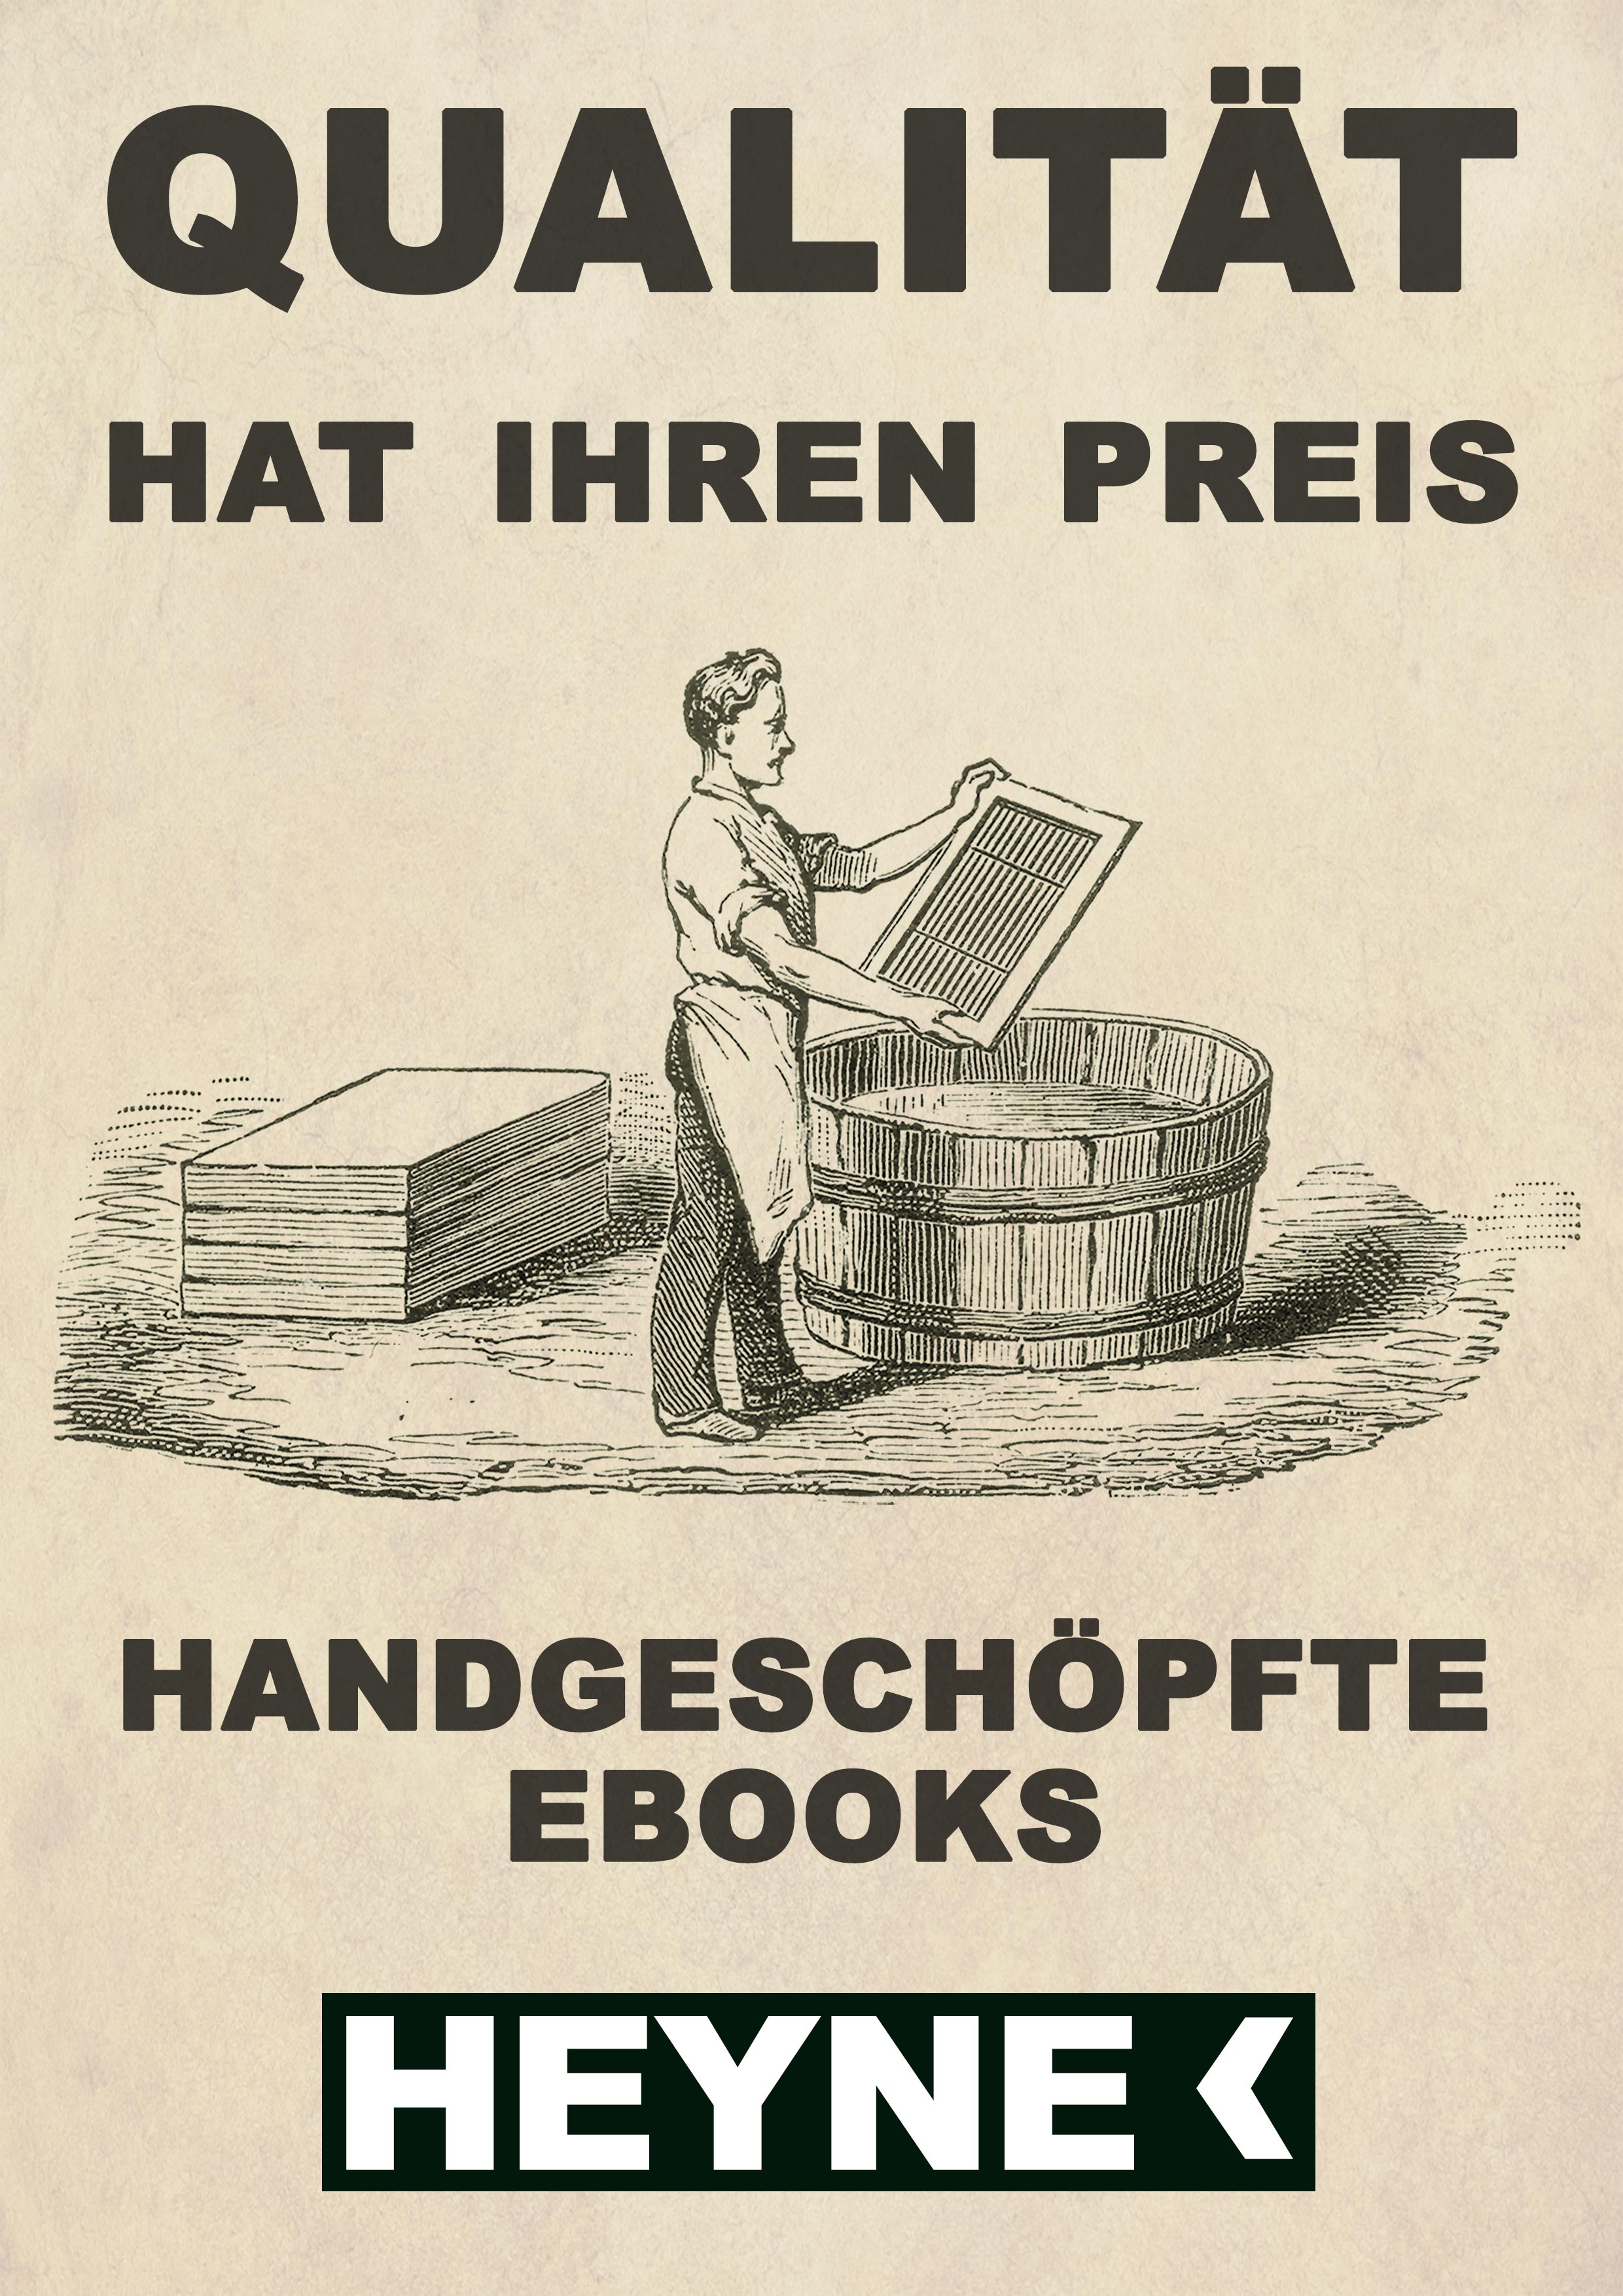 Handgeschöpfte eBooks